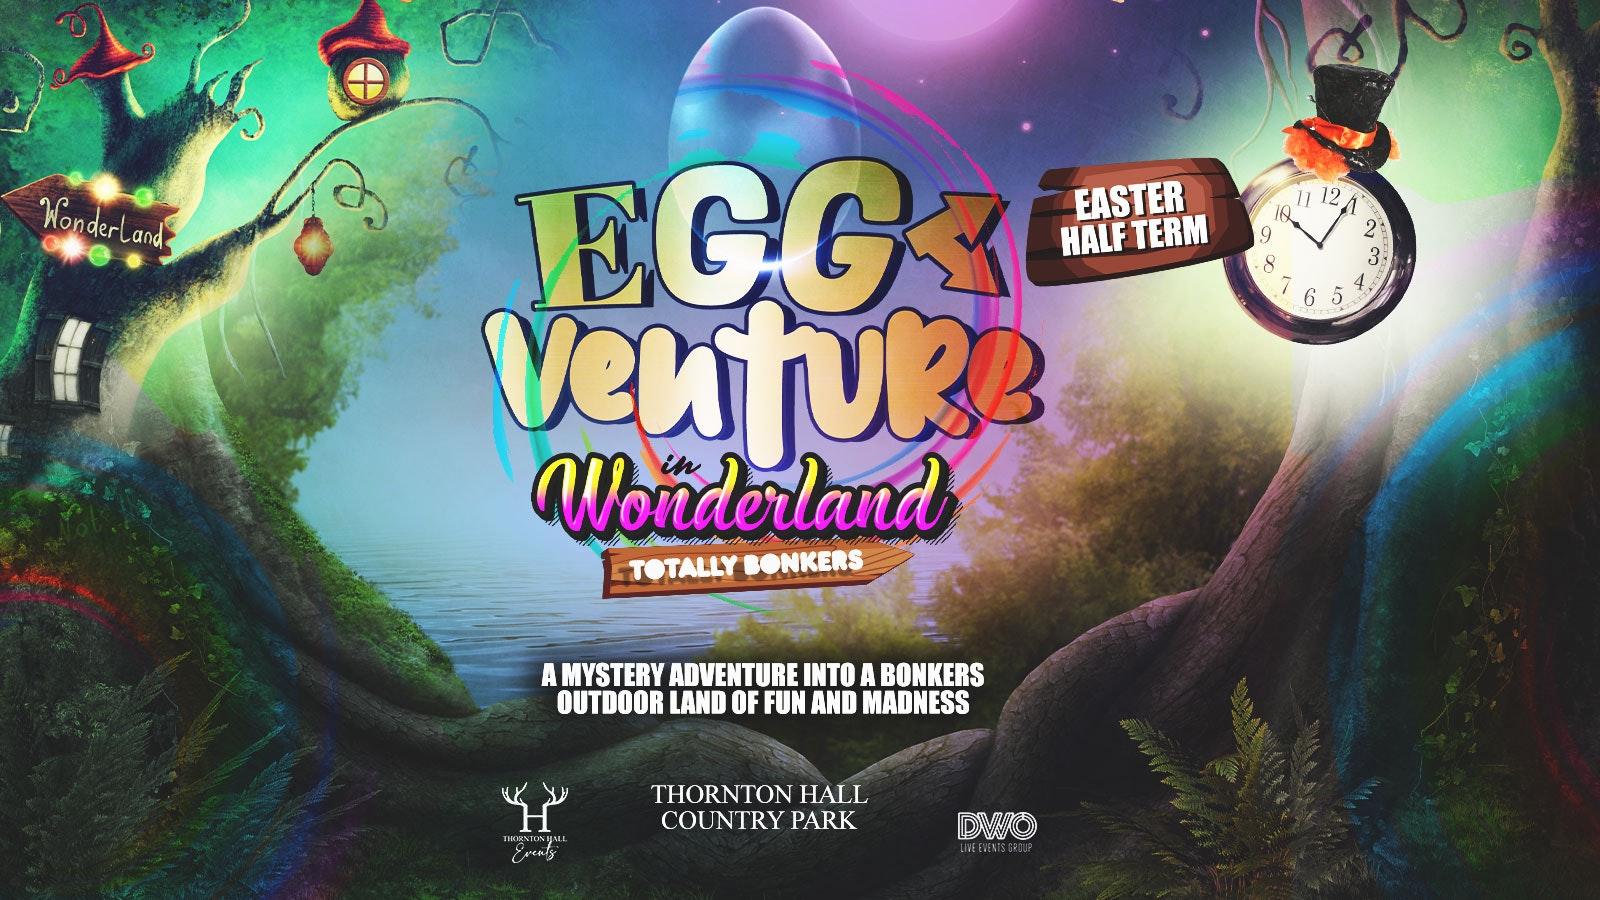 EggVenture in Wonderland – Thursday 8th April – 12.30pm